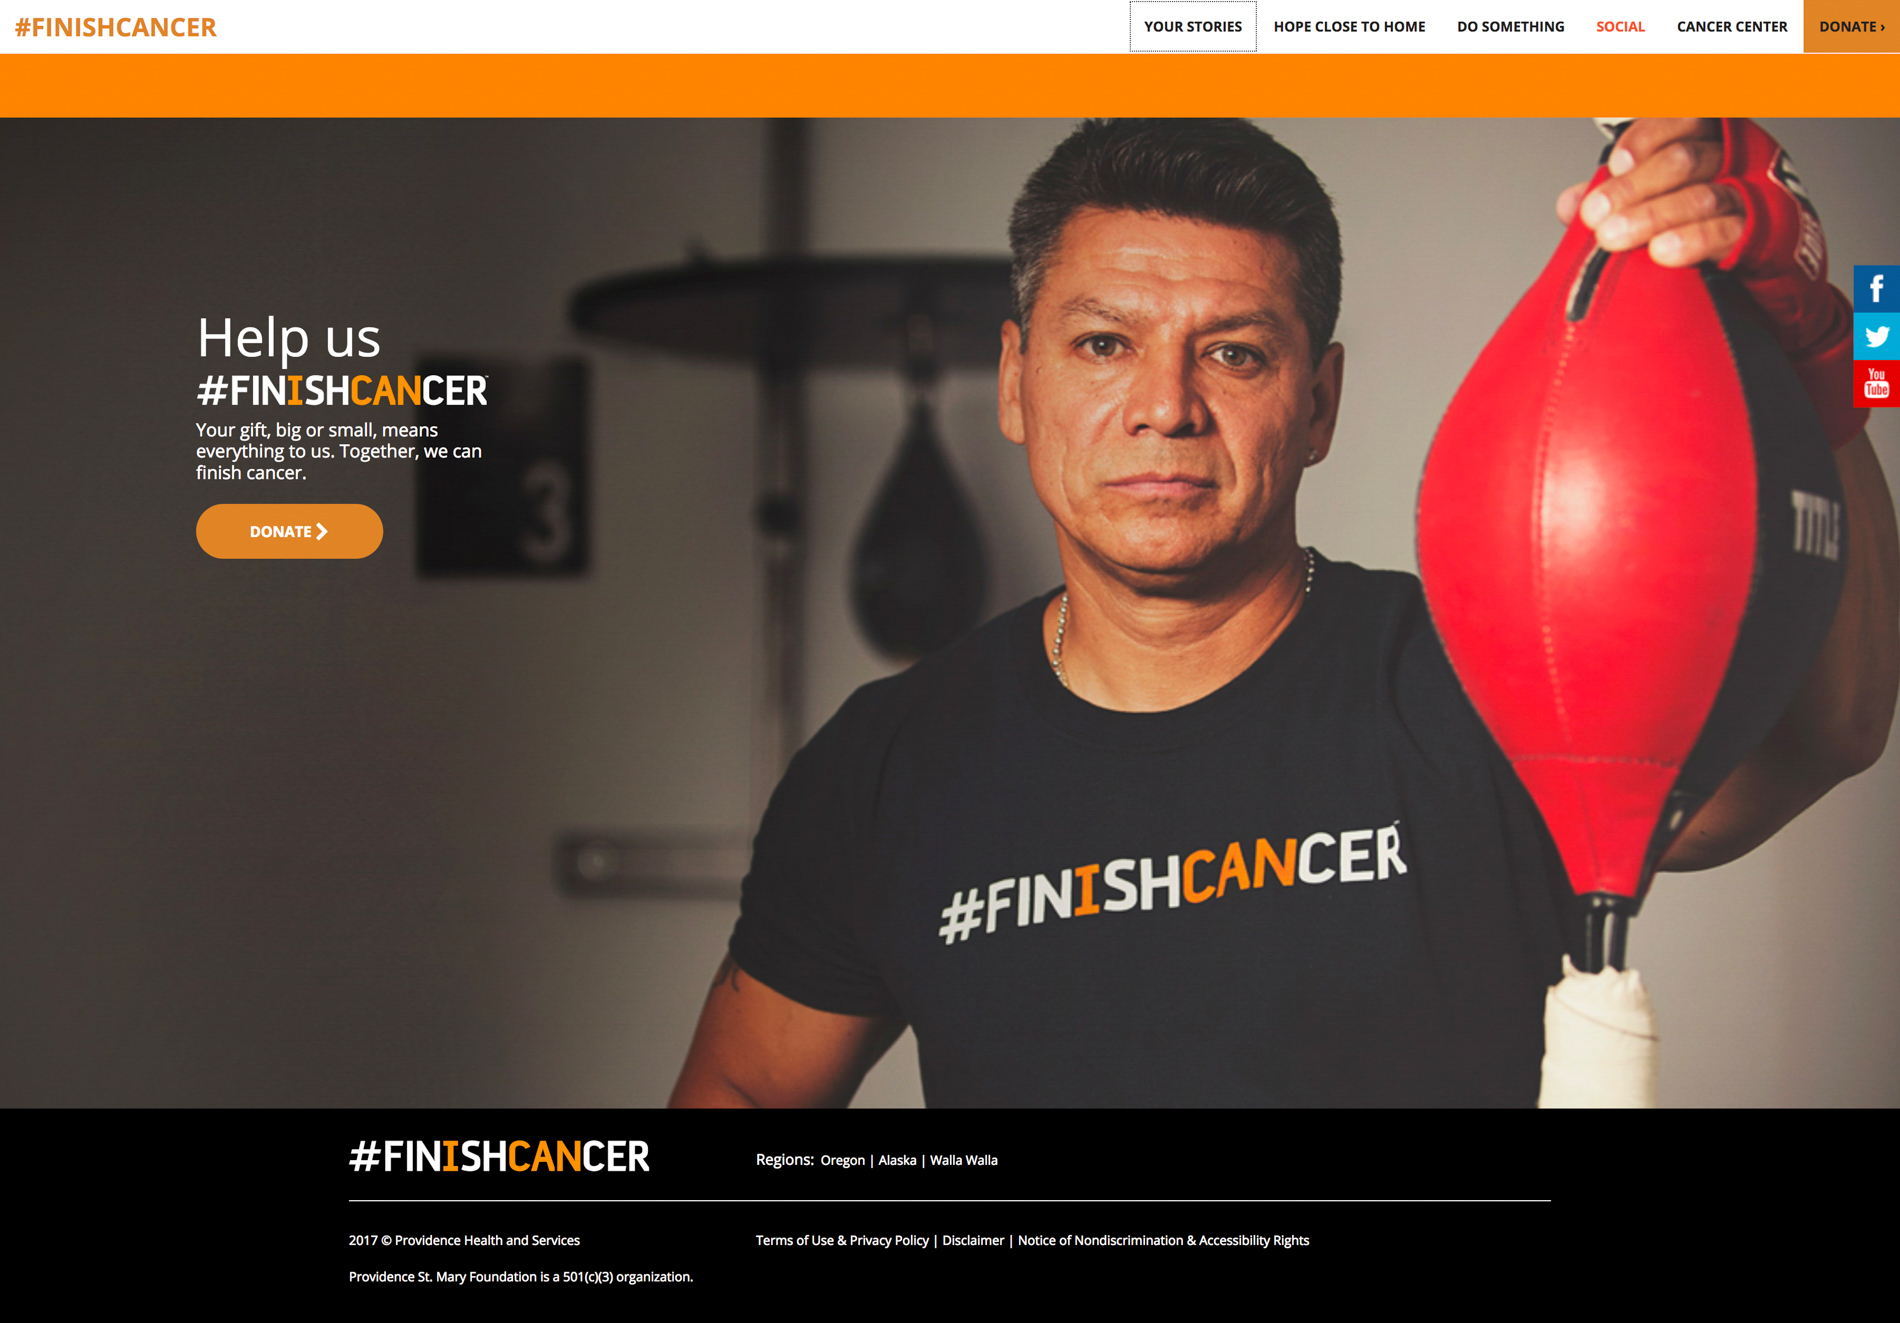 #finishcancer campaign